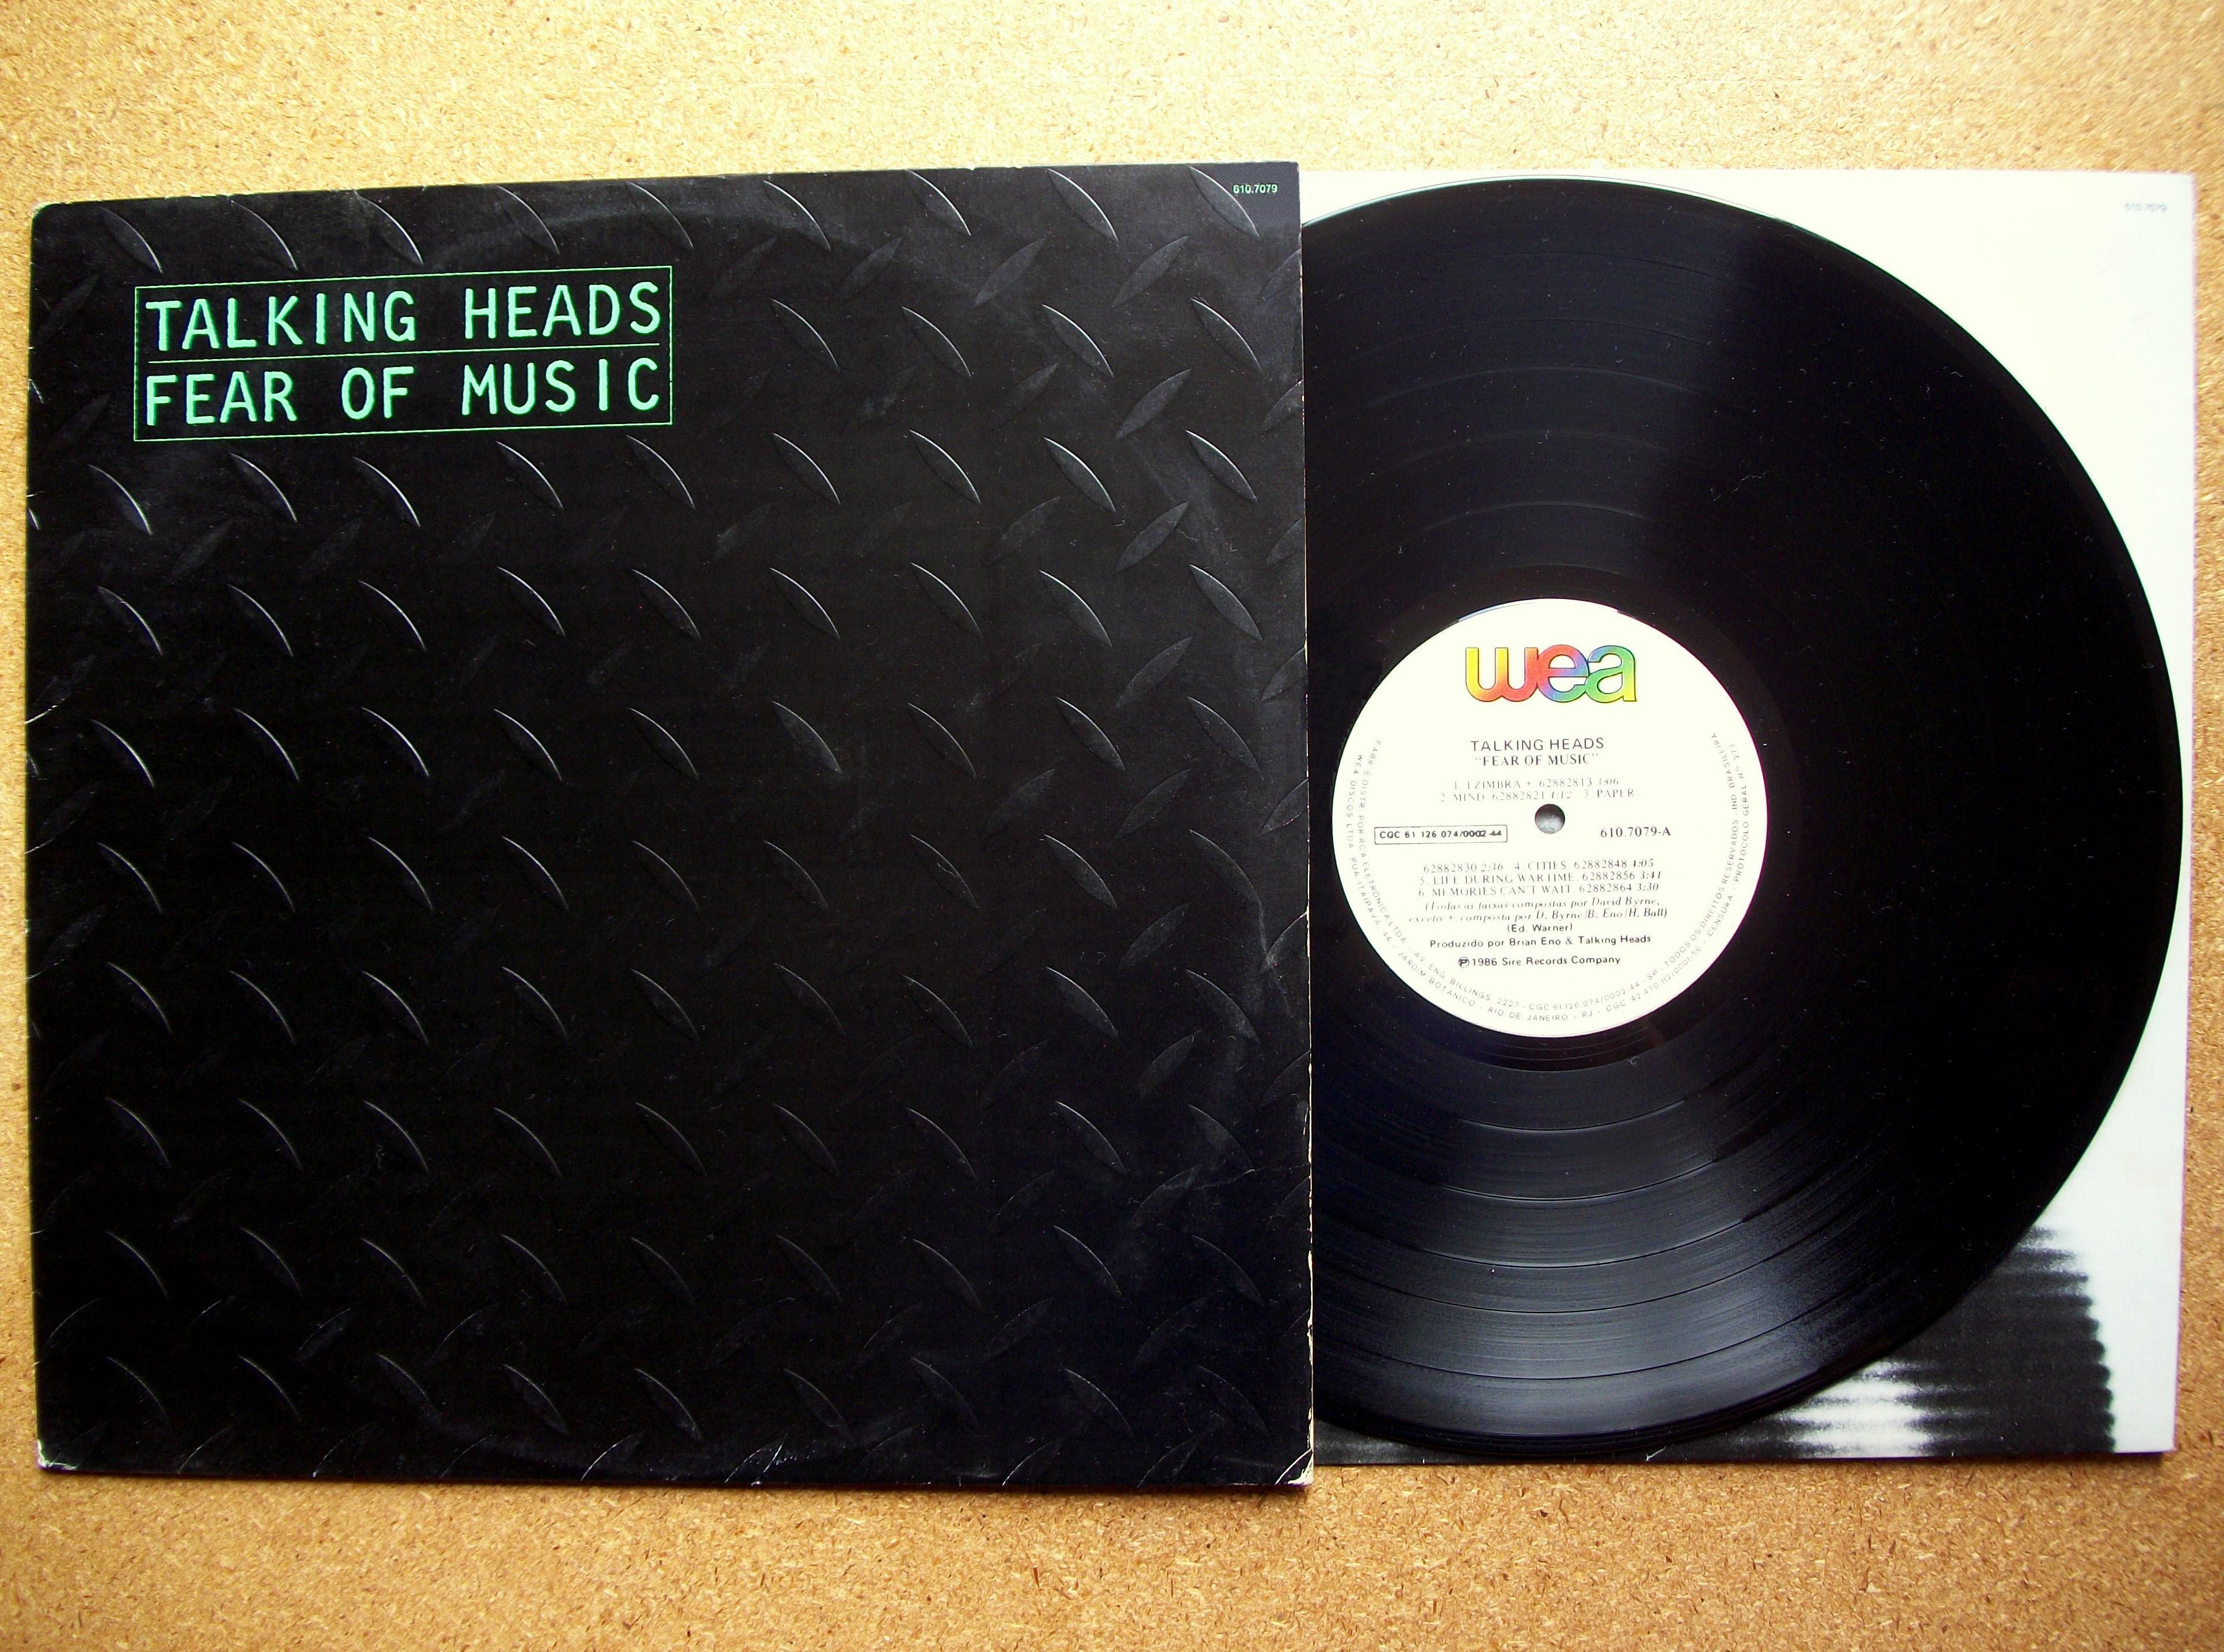 Talking Heads Sinister Salad Musikal S Weblog